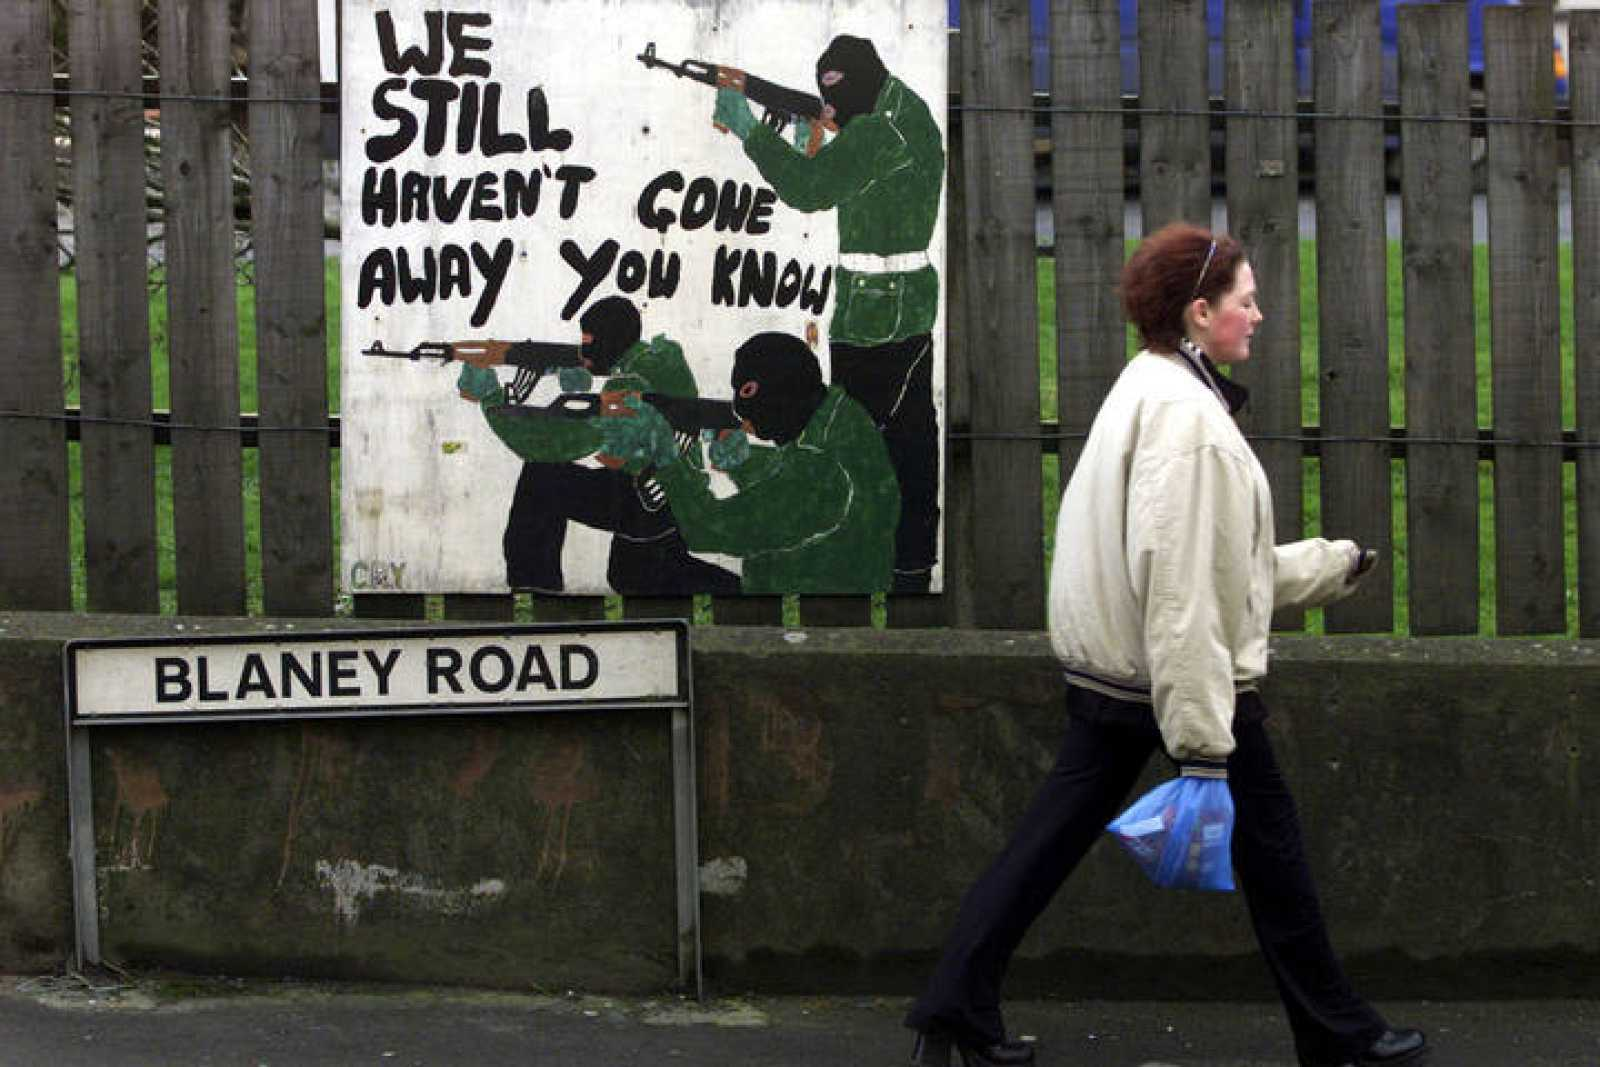 GRAFFITI SUPPORTING THE IRA APPEARS IN CROSSMAGLEN.